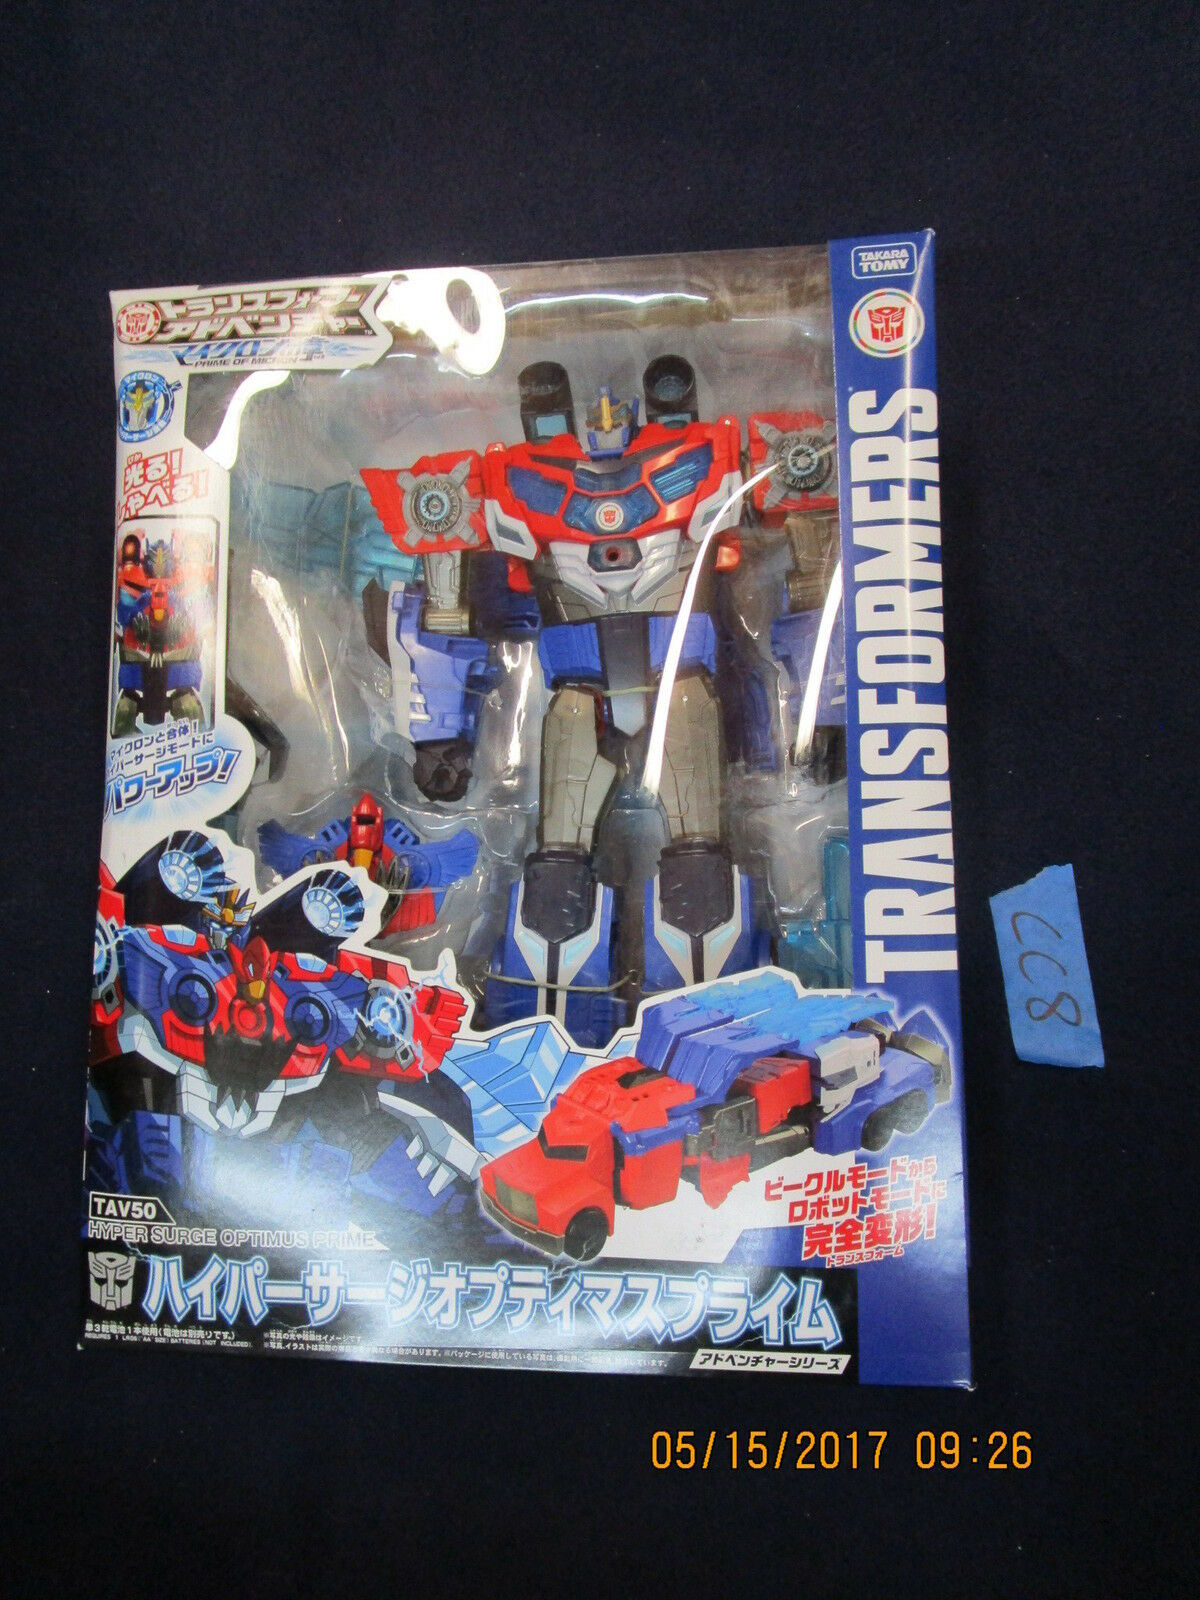 Takara Transformers Adventure Lot TAV50 HYPER SURGE OPTIMUS PRIME of Micron rid